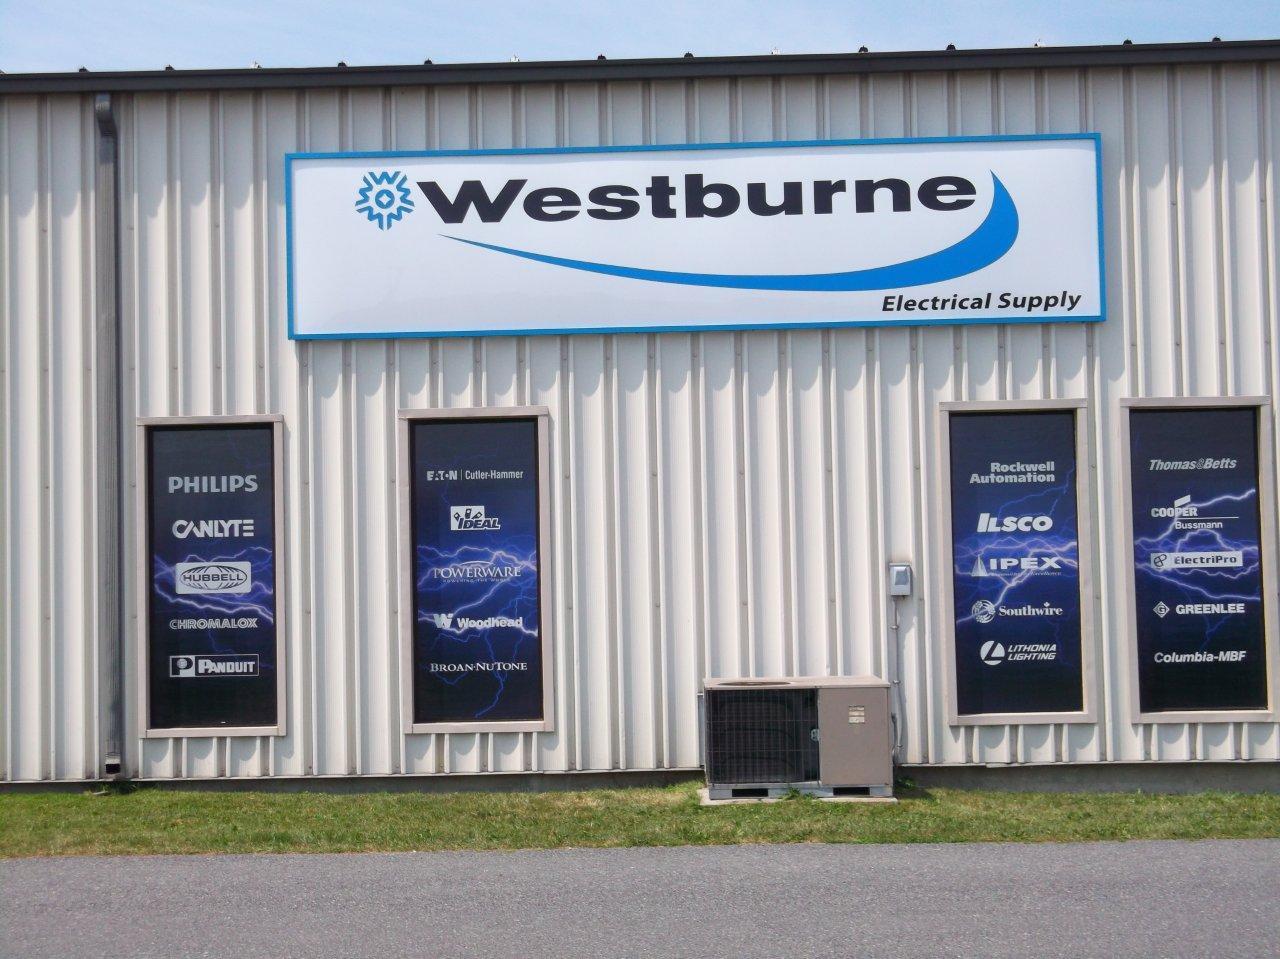 Westburne exterior sign